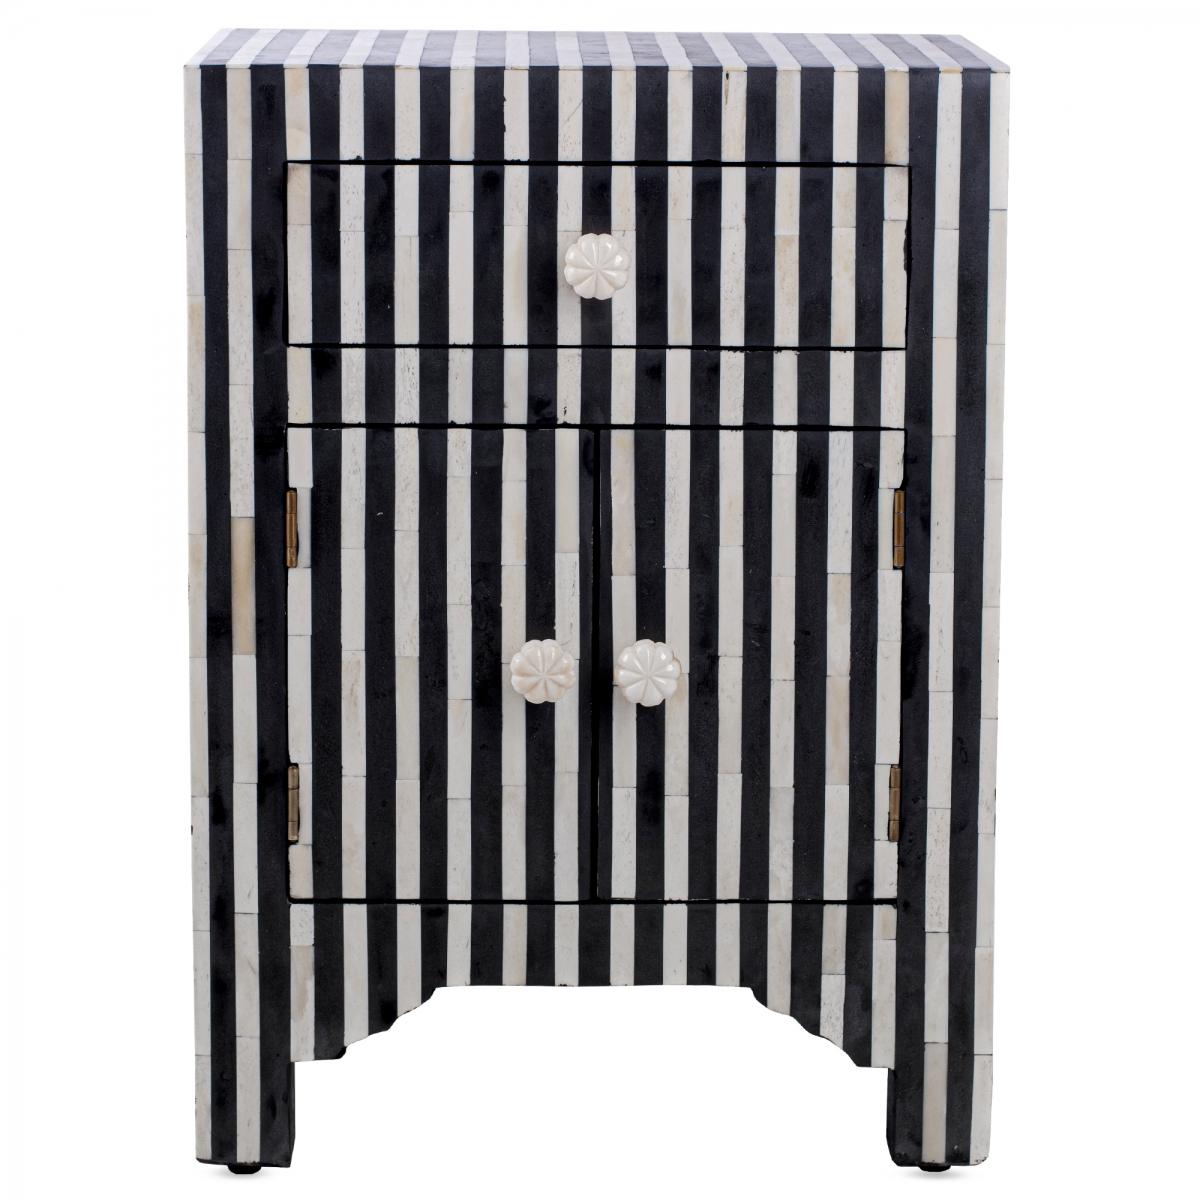 Тумба Inlaid Bone Stripes  - фото 1